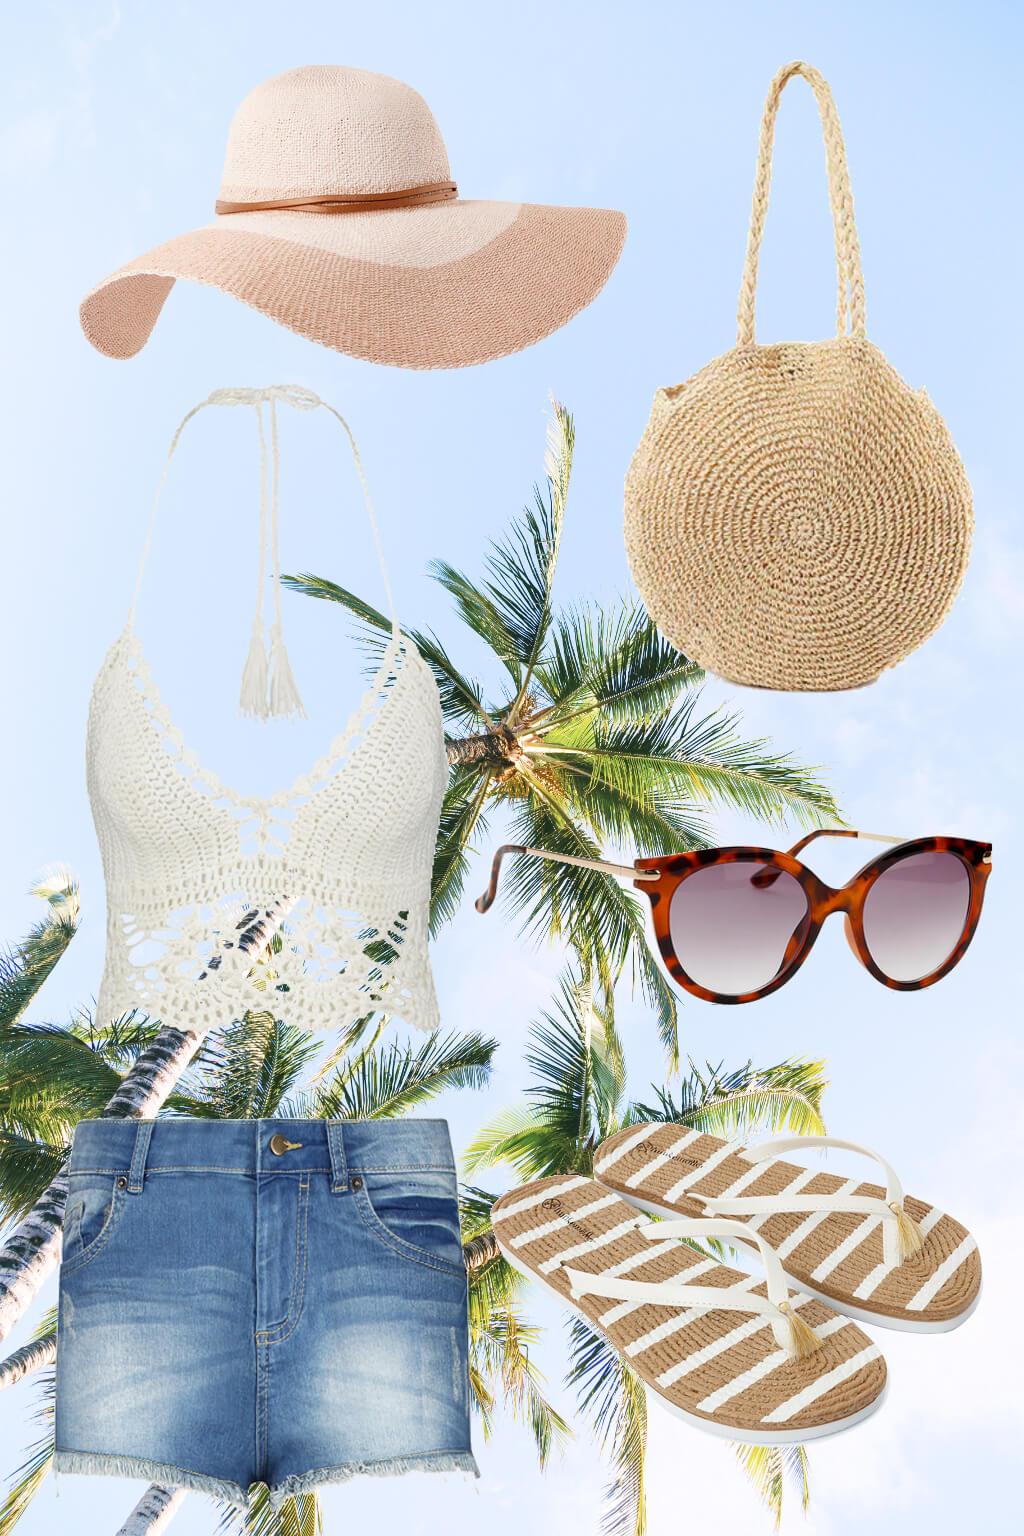 bademode natürliche materialien badeanzug trends 2019 hunkemöller stripes shopping tantedine